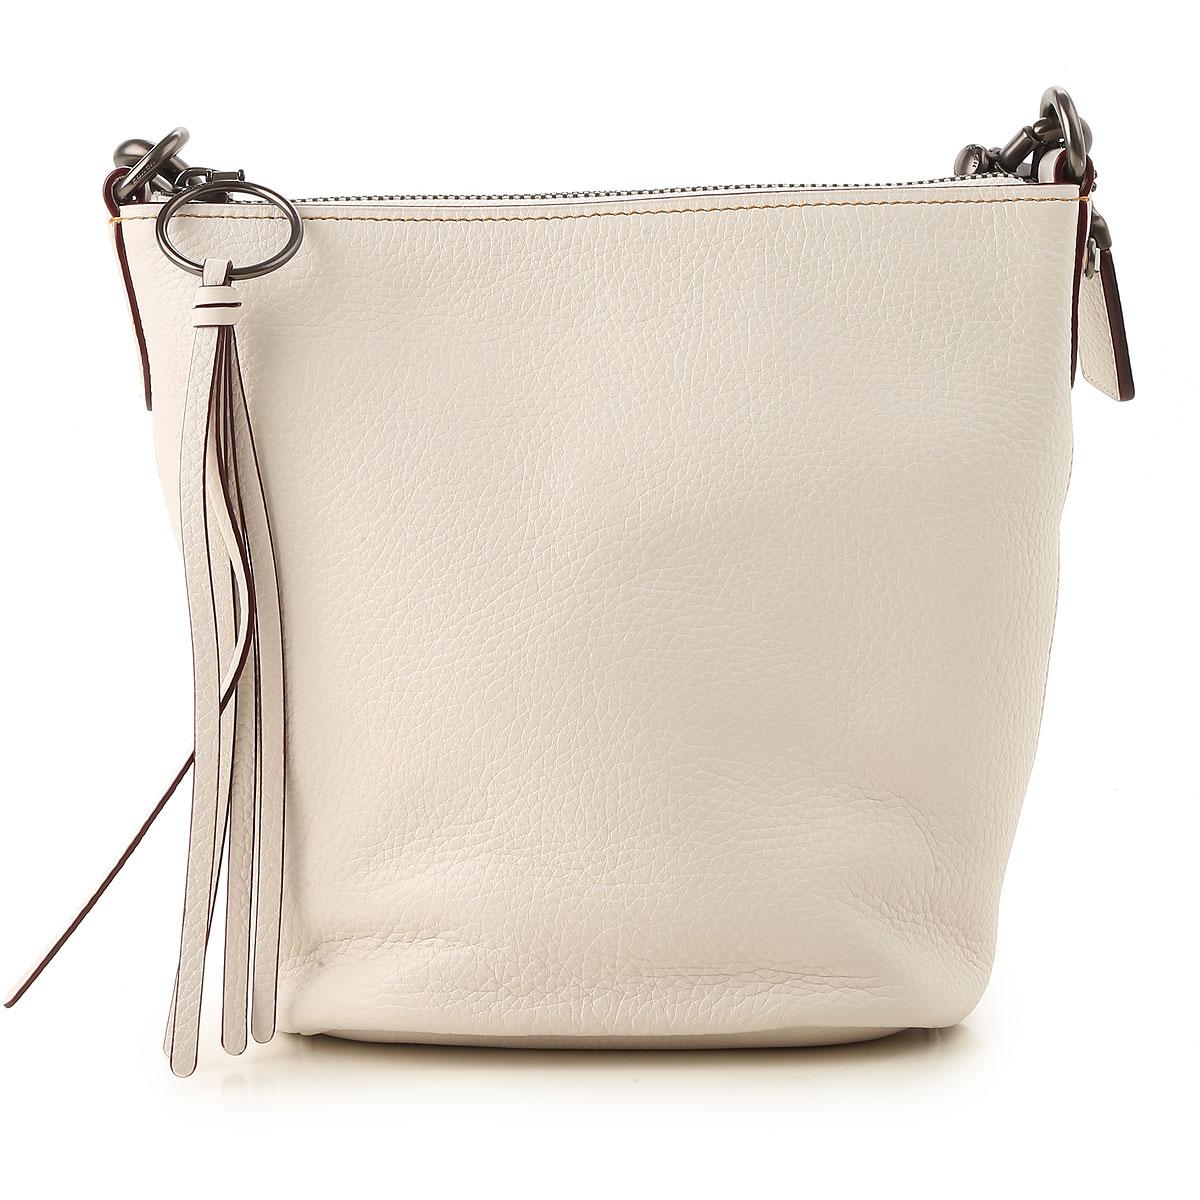 Image of Coach Shoulder Bag for Women, Milk, Leather, 2017